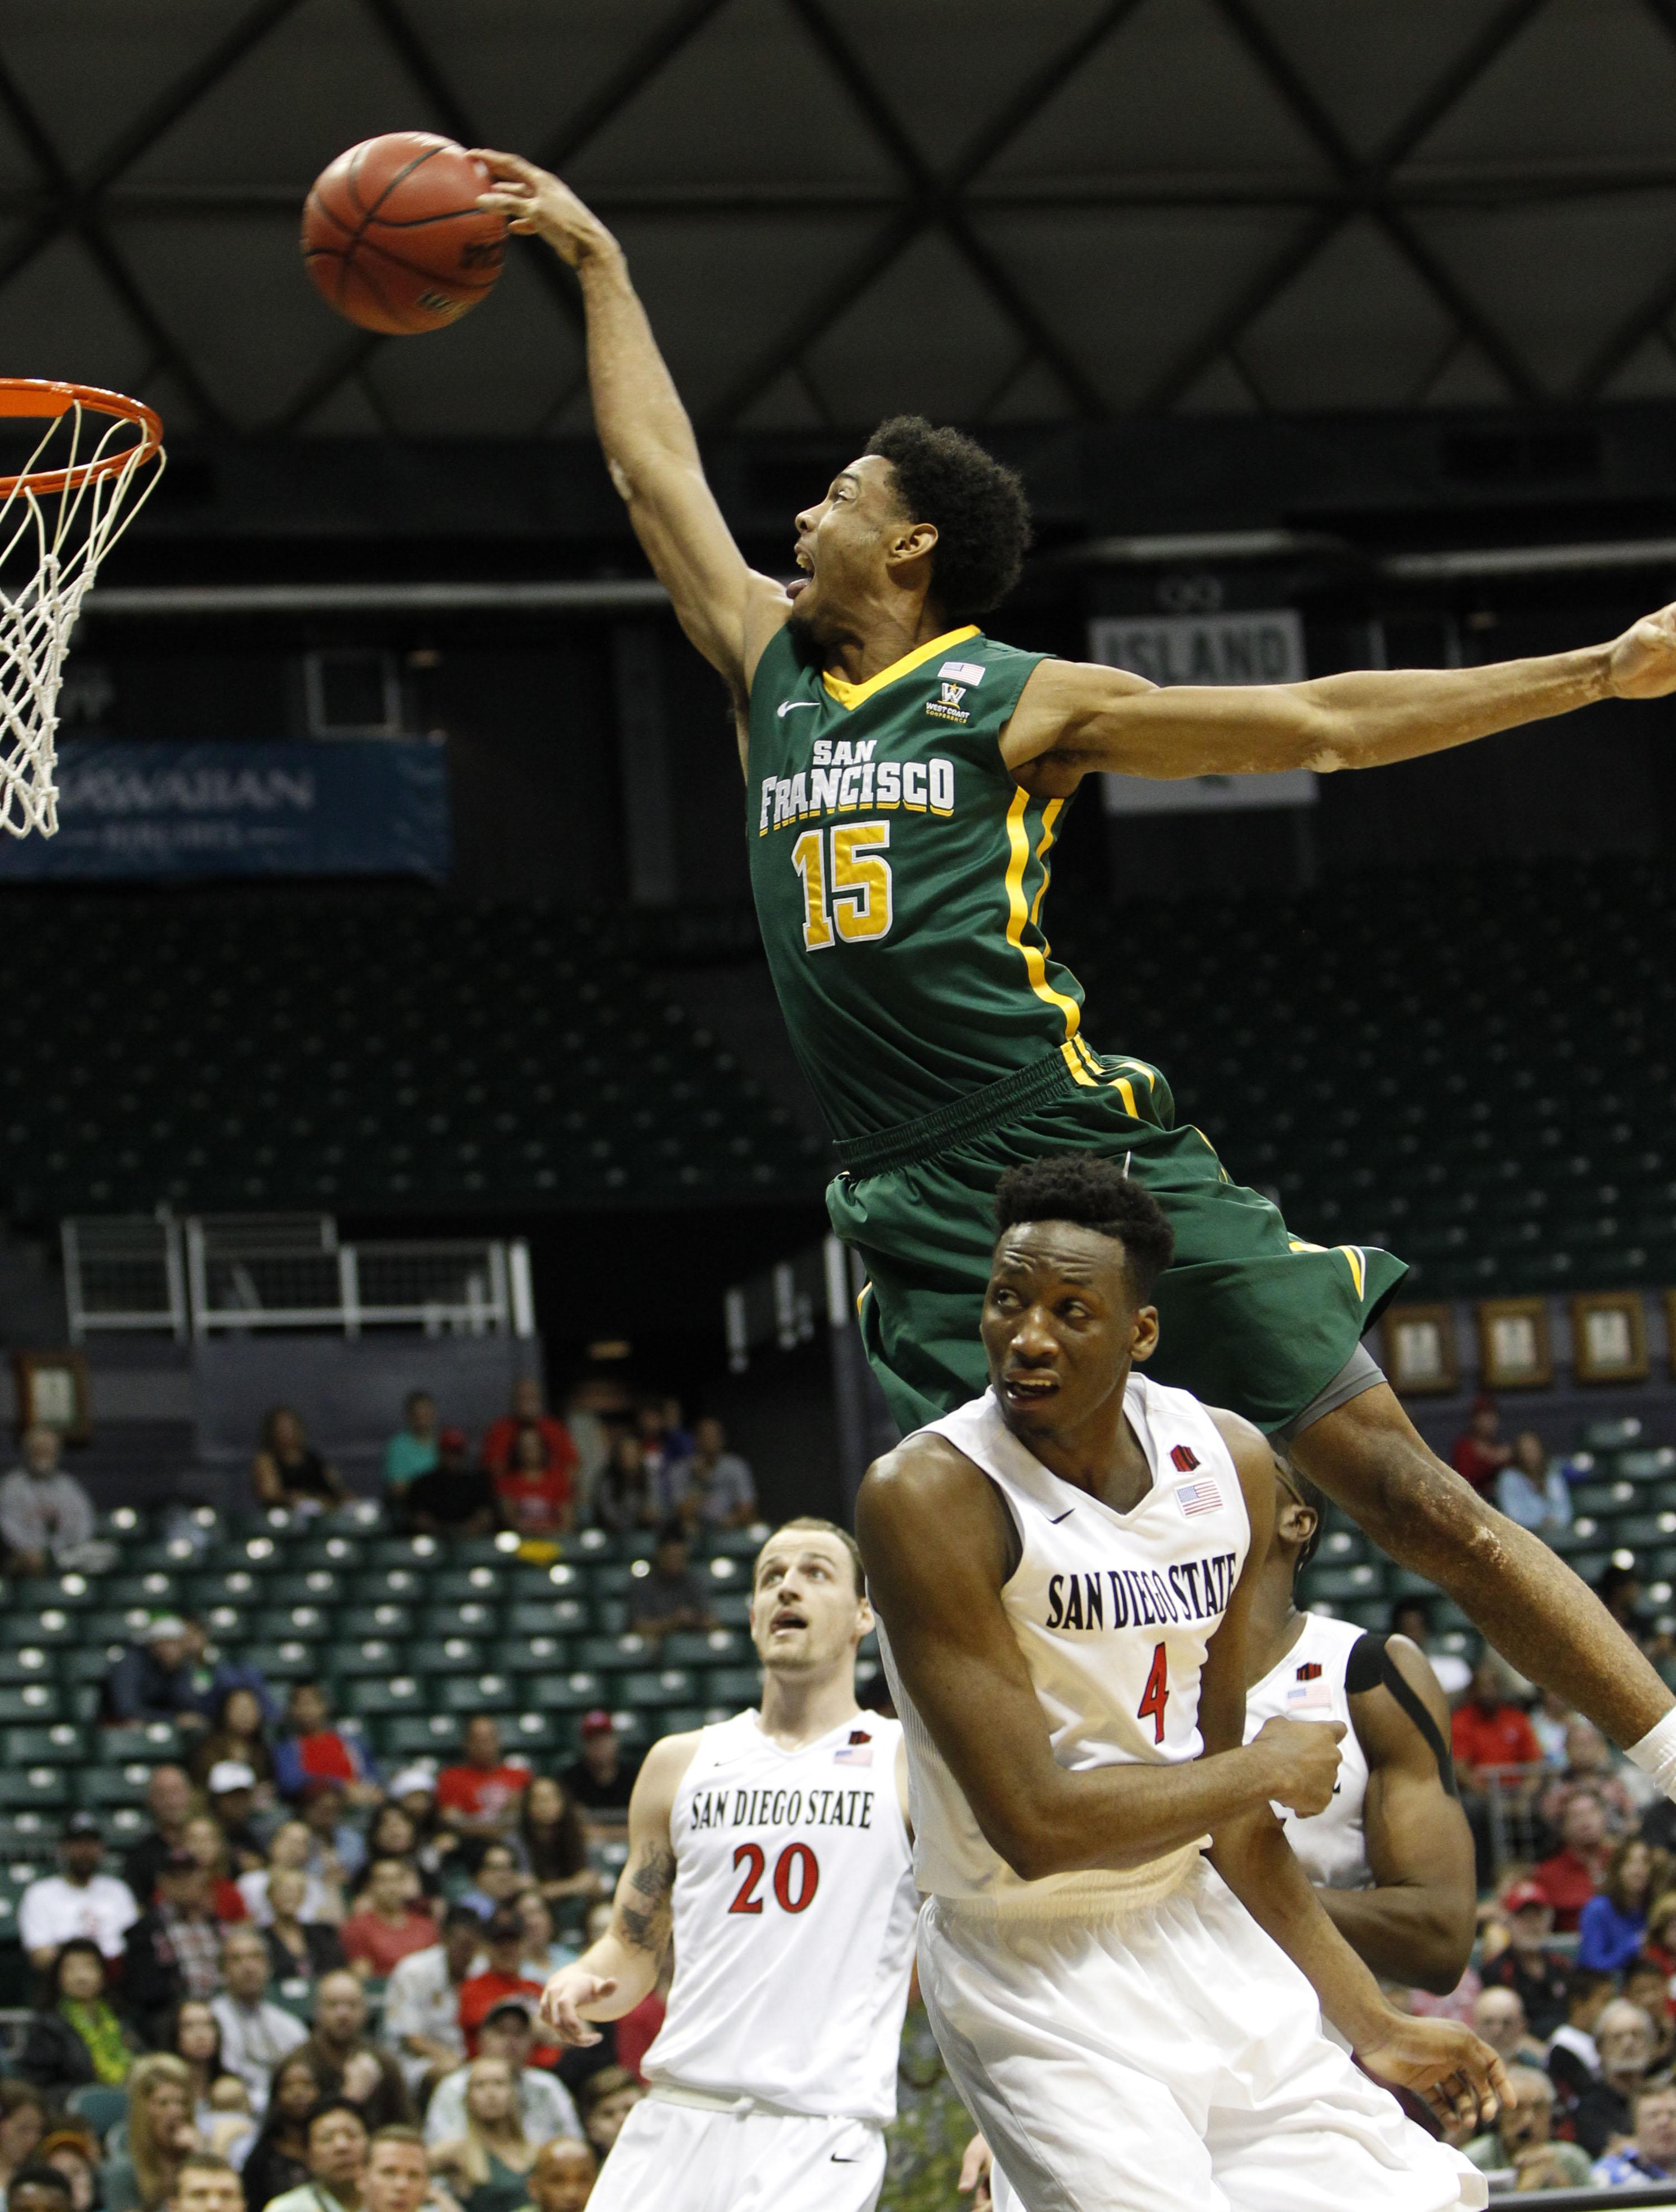 NCAA Basketball: San Francisco at San Diego State